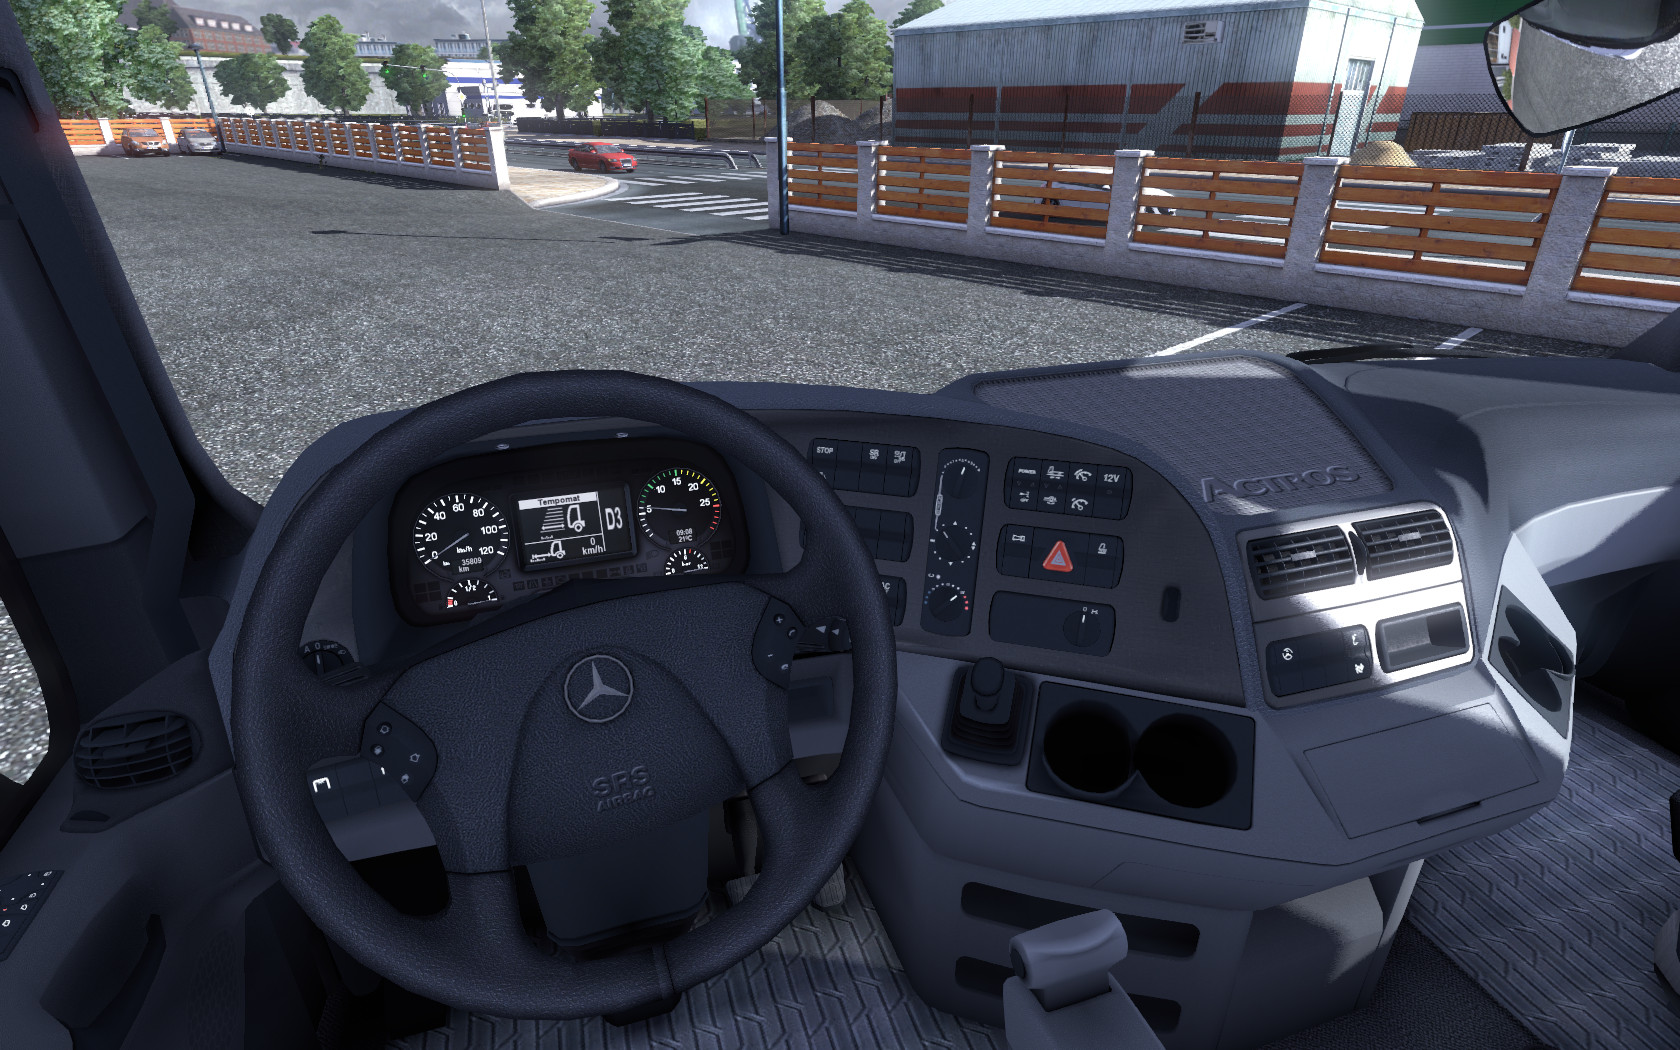 [Sammelthread] Euro Truck Simulator 2 [Reifenupdate + Reale Reifen DLC geteasert]-ets2_00143.jpg